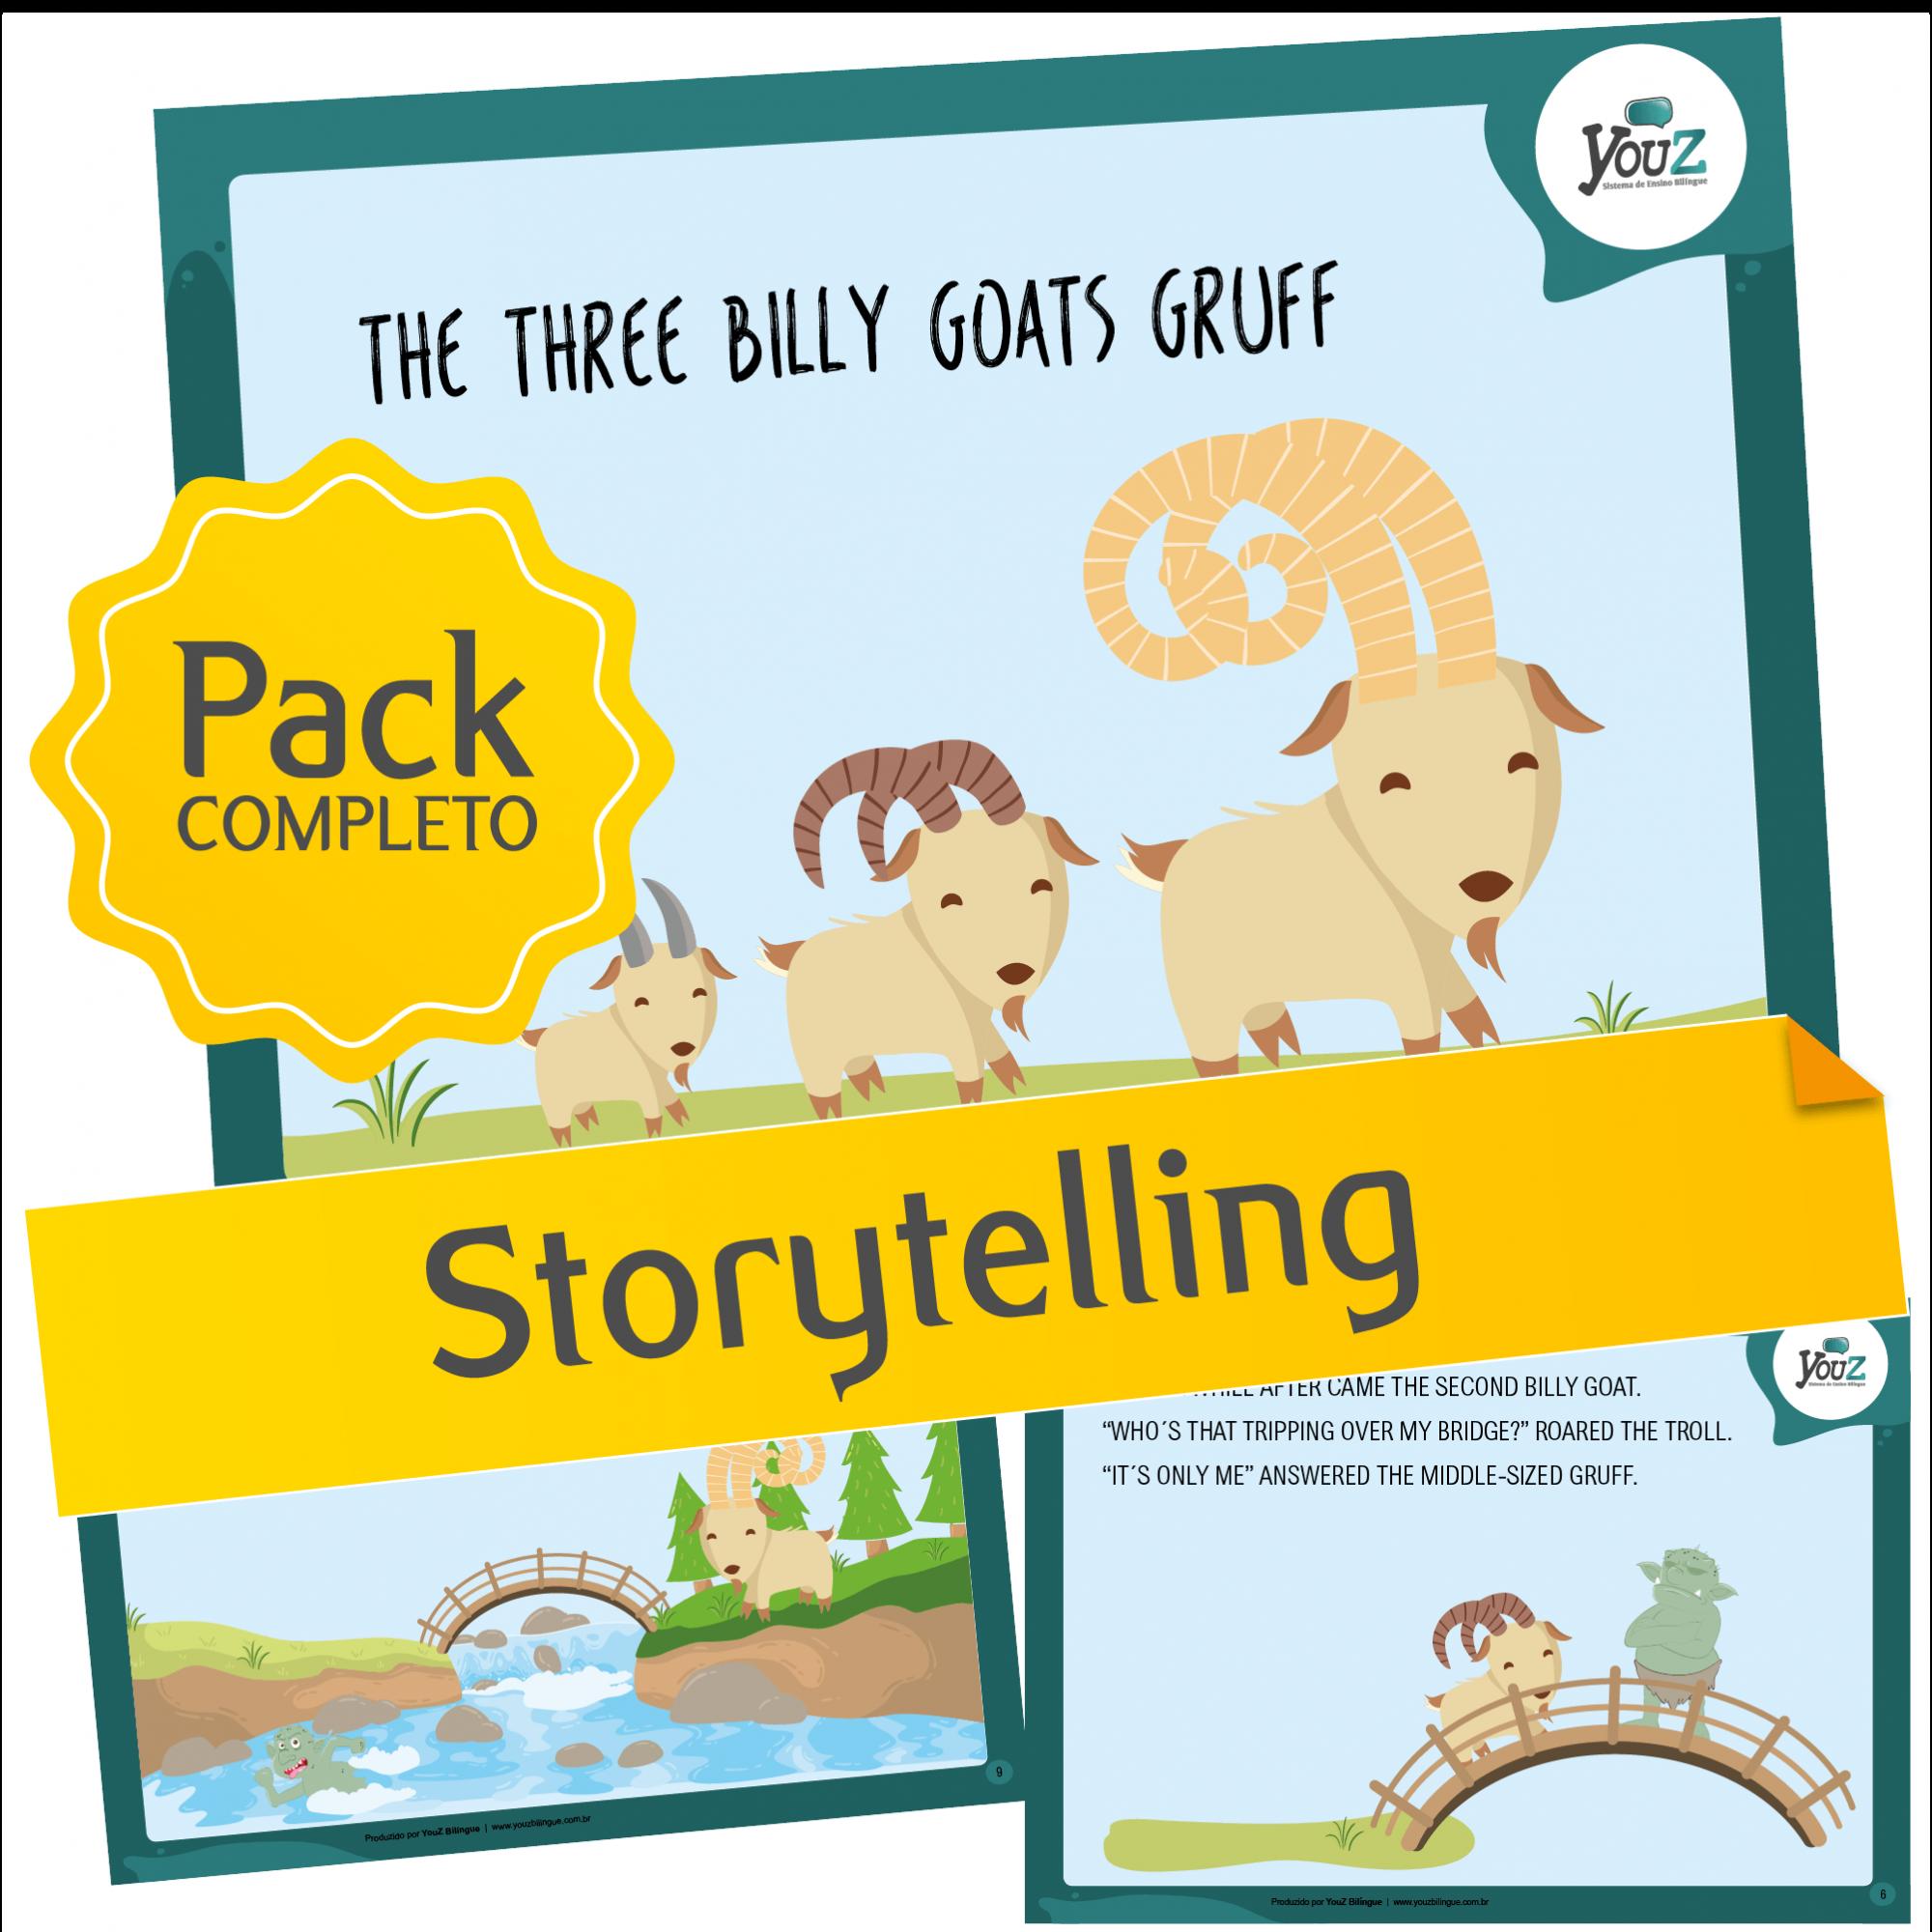 The Three Billy Goats Gruff - Storytelling activities